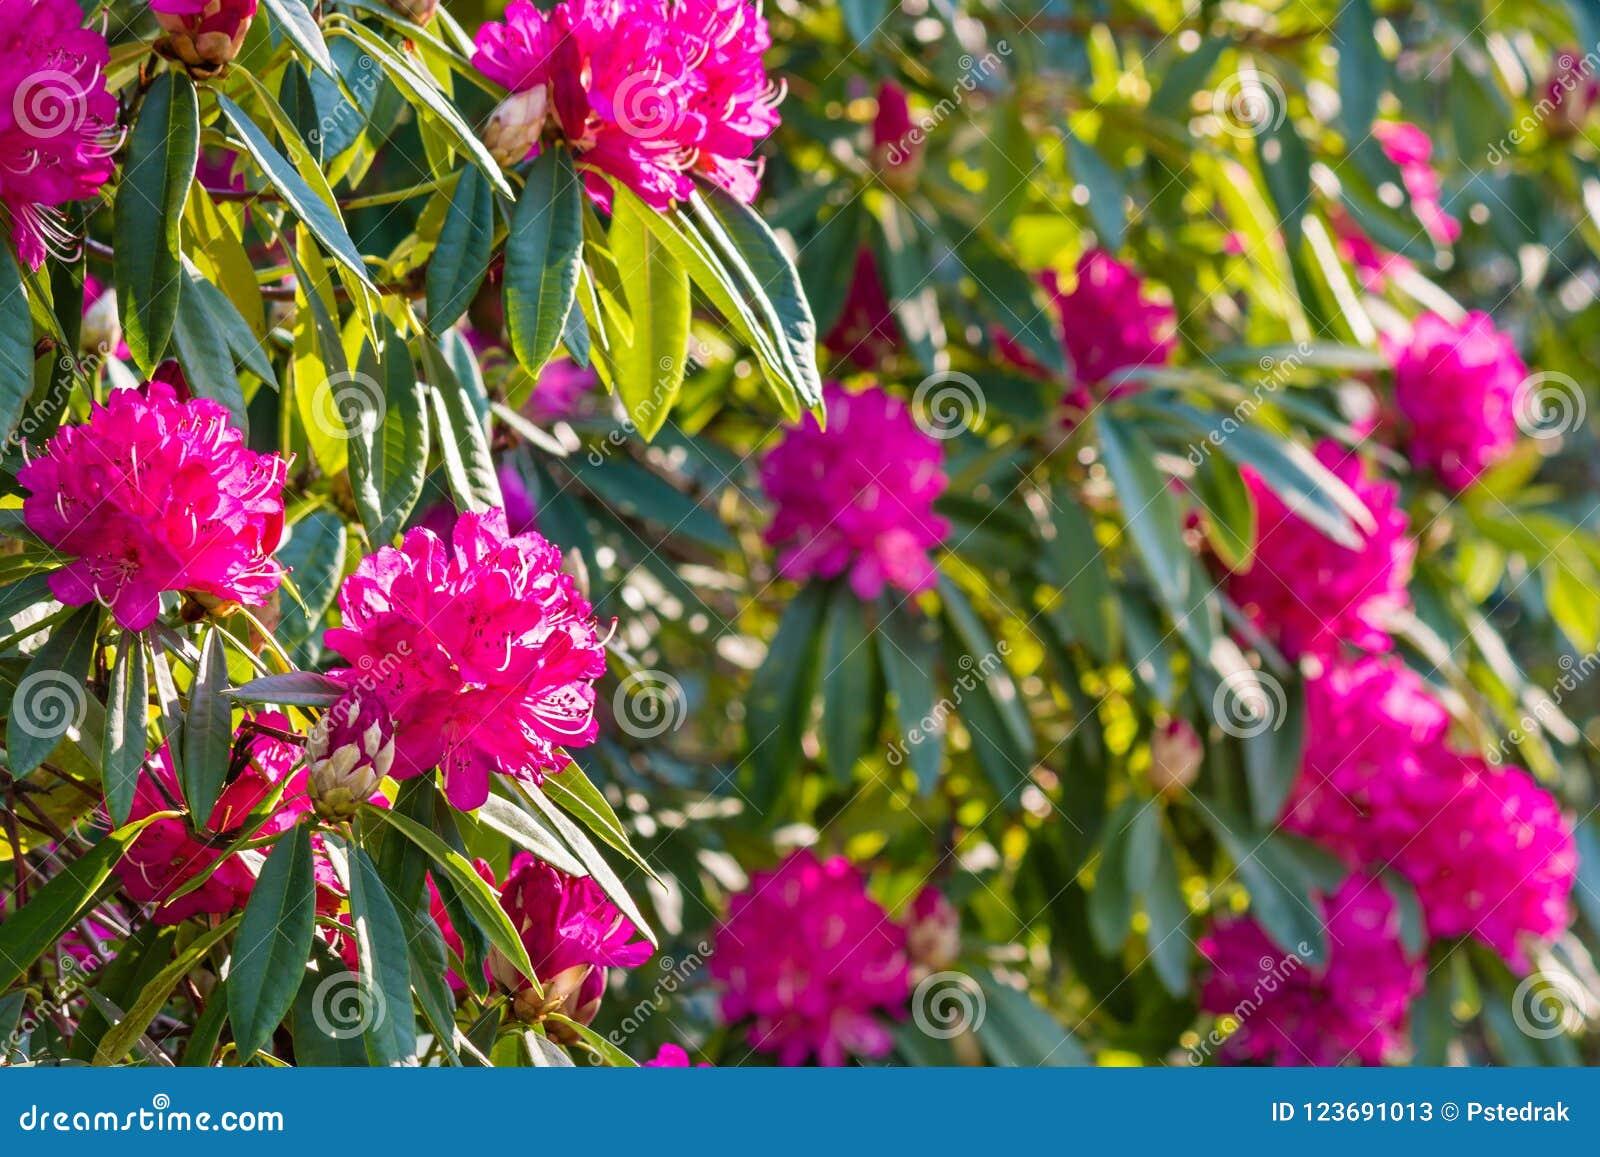 Rhododendrum Grandiflorum Bush With Pink Flowers In Bloom Stock